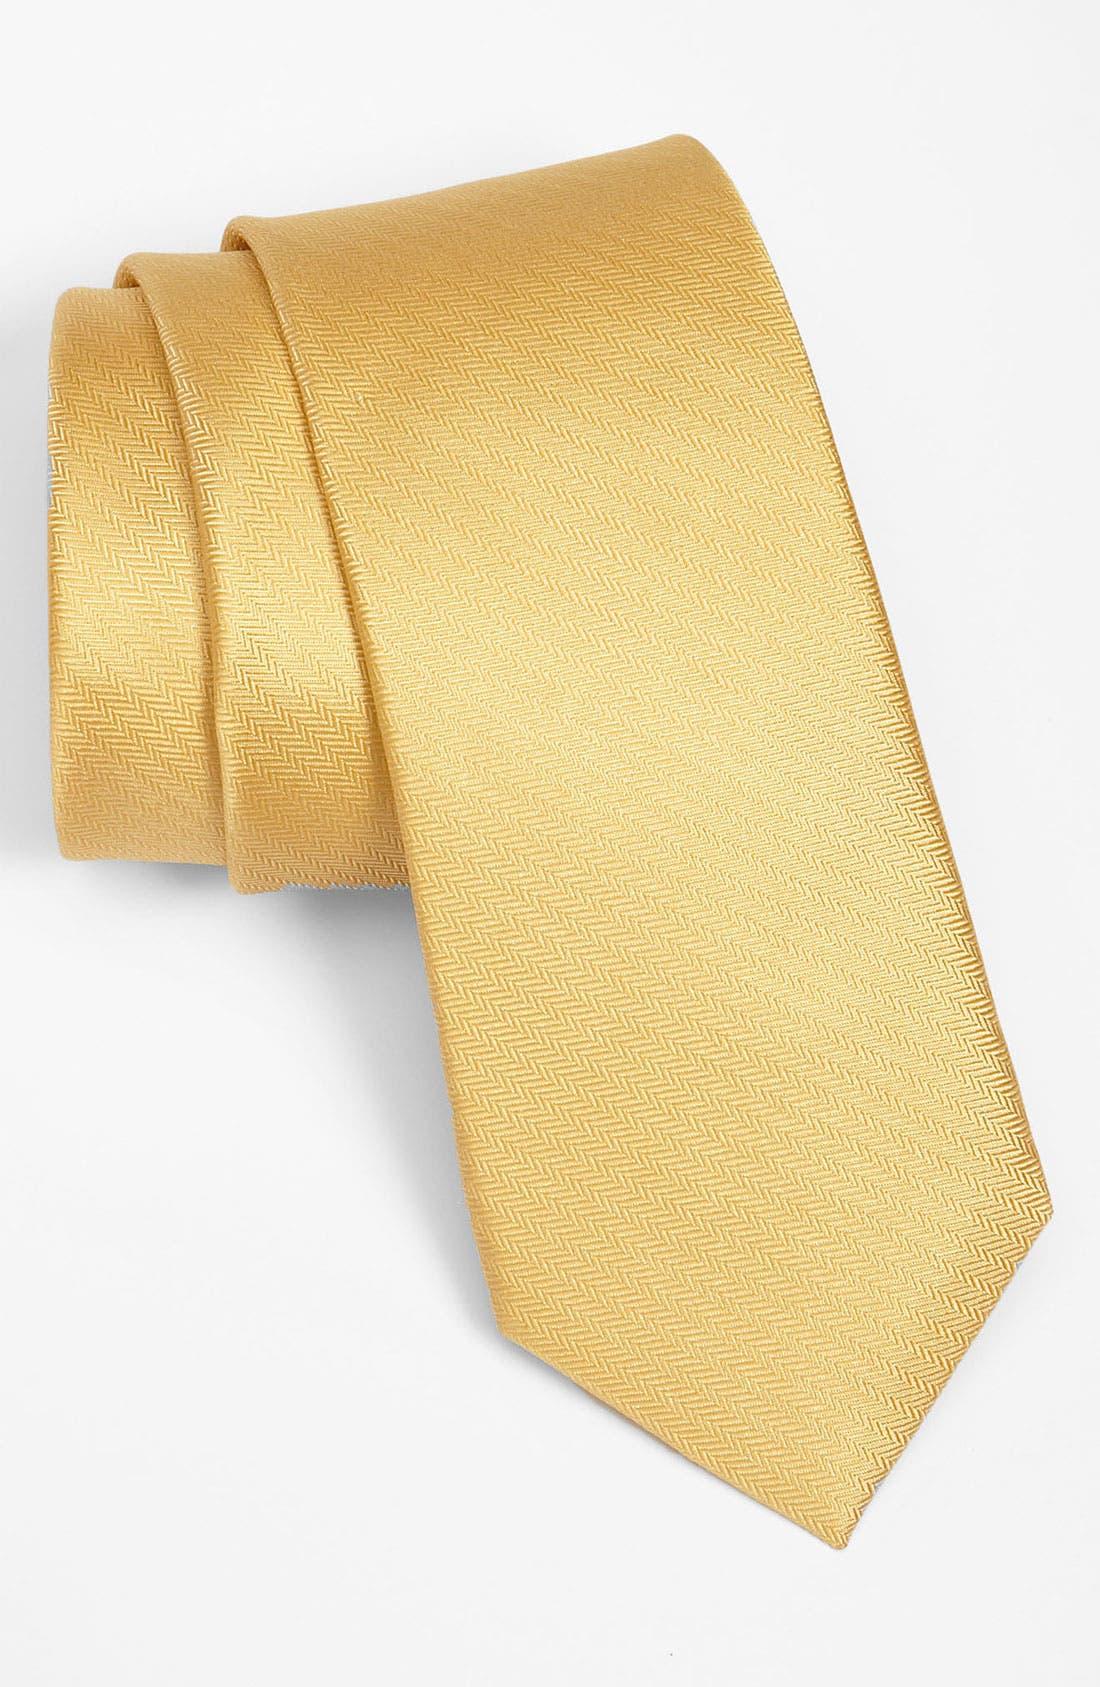 Alternate Image 1 Selected - 1901 Woven Silk Tie